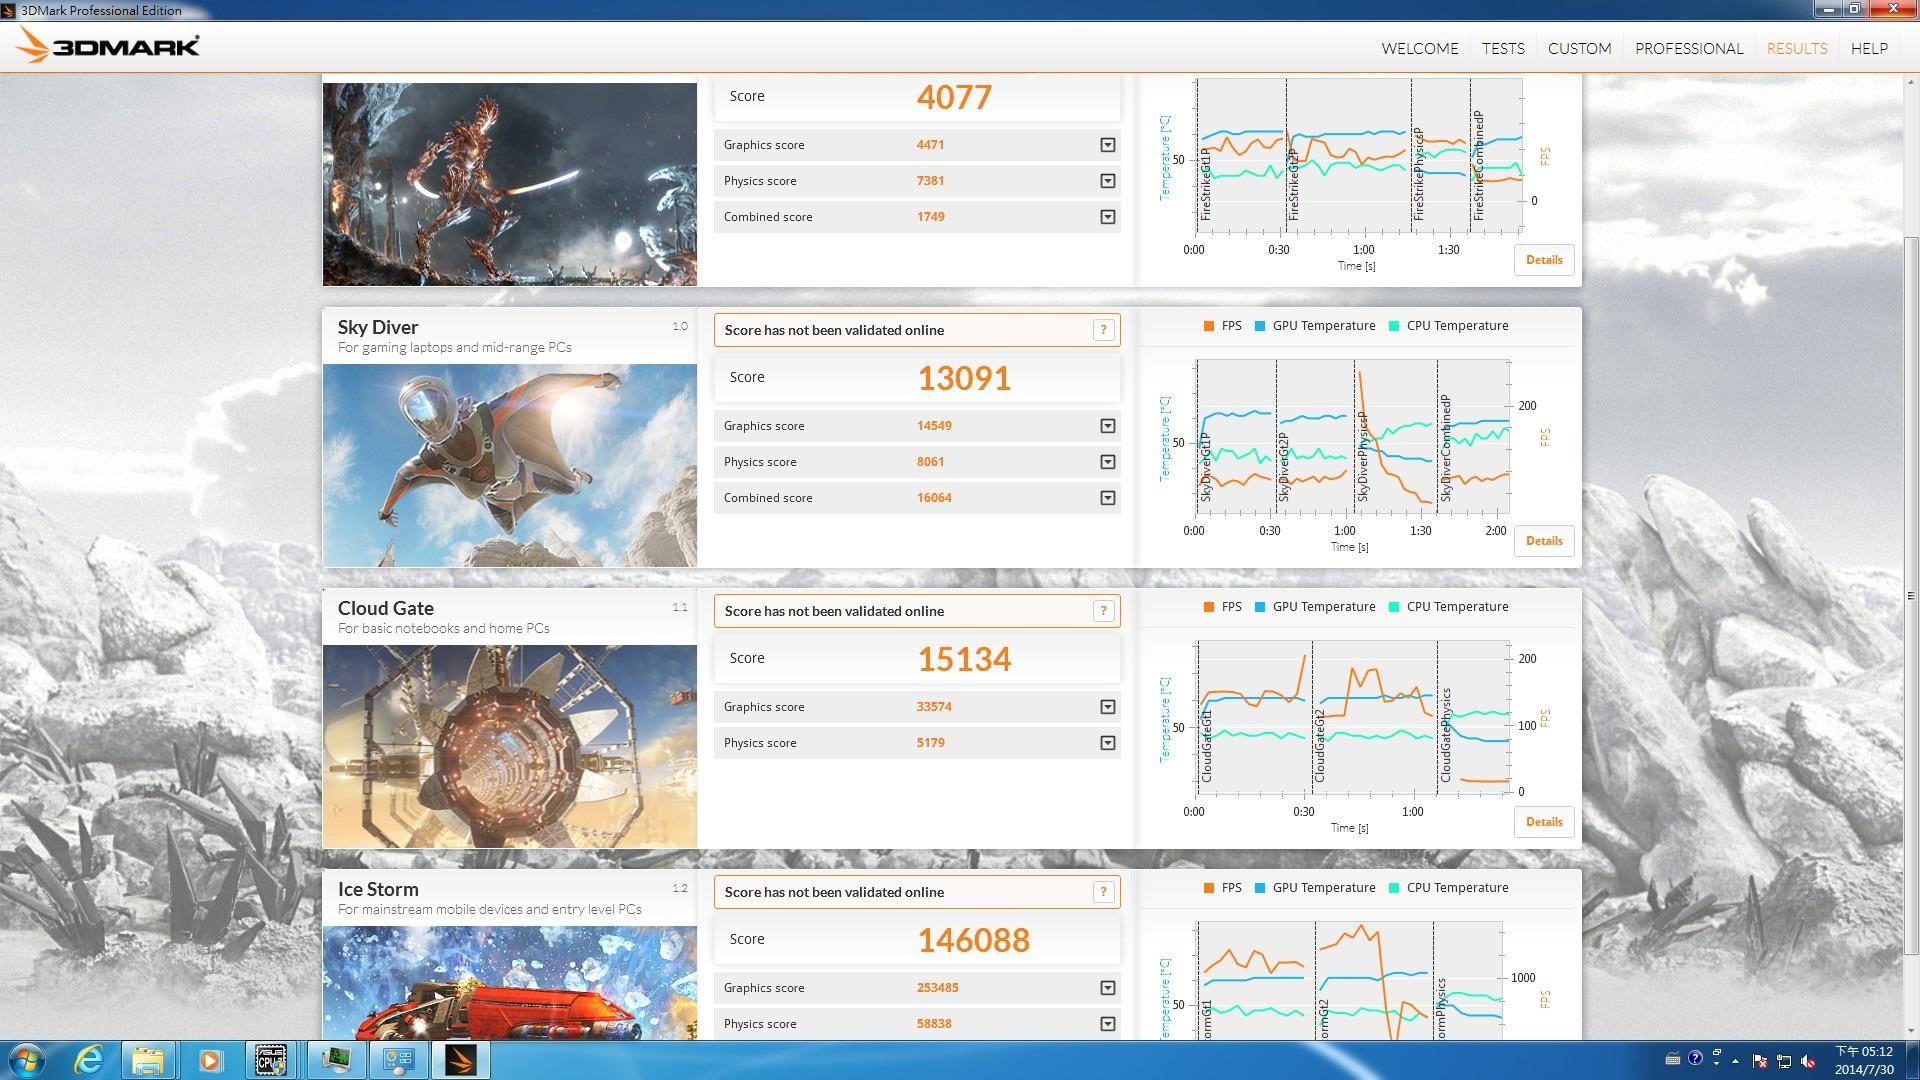 [XF]H97系列遊戲超頻新組合! ASUS H97-PRO GAMER遇上ASUS STRIX GTX 750TI 開箱遊戲實測